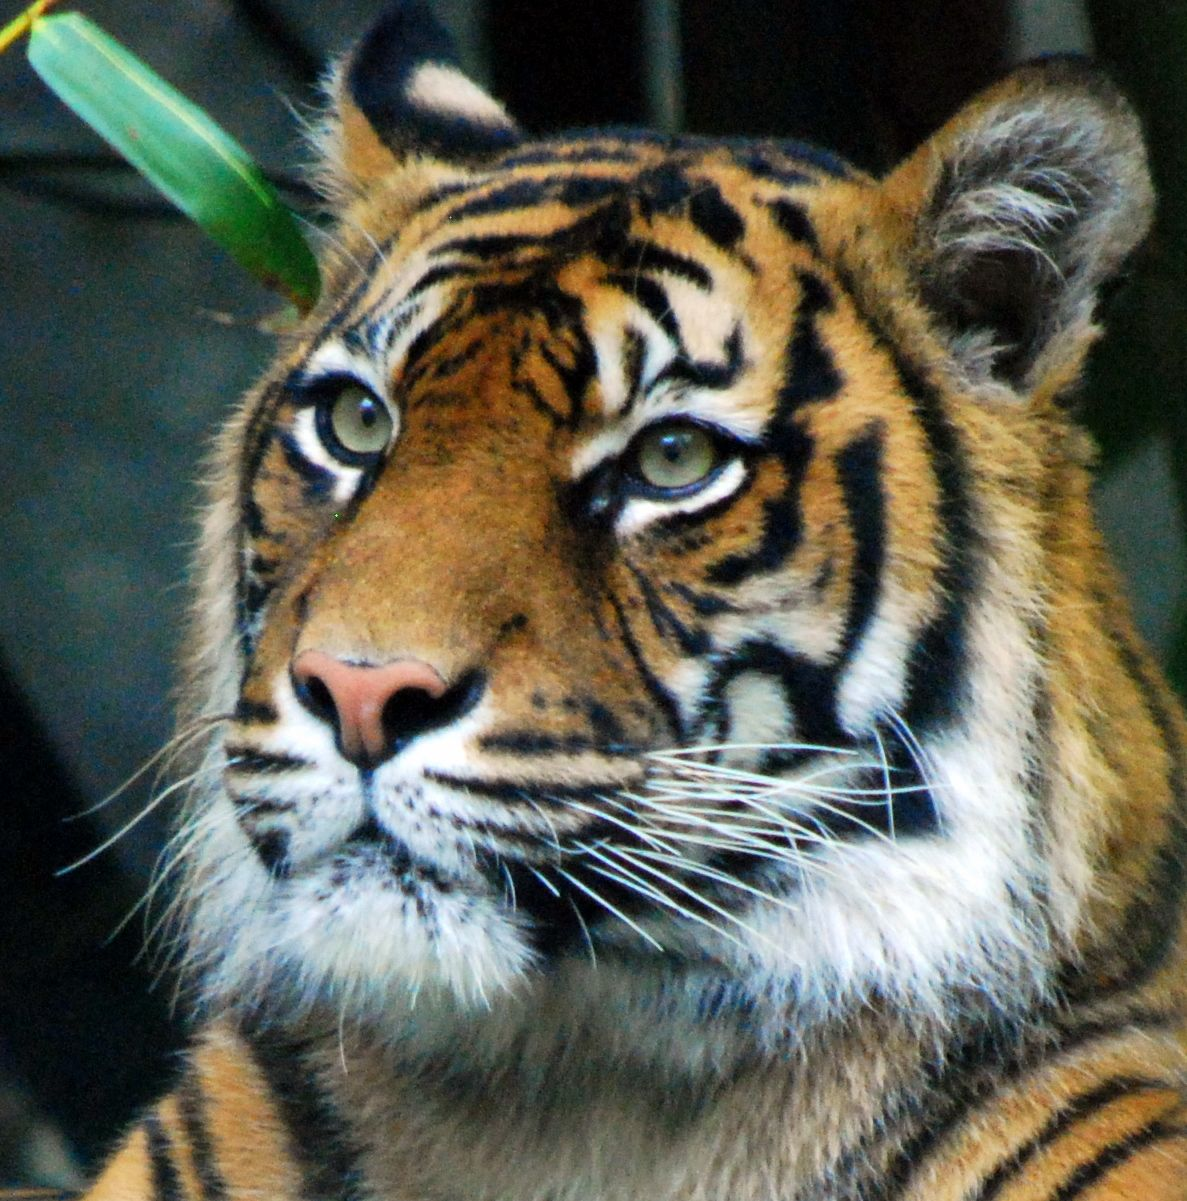 » Tiger Face Side View Endangered